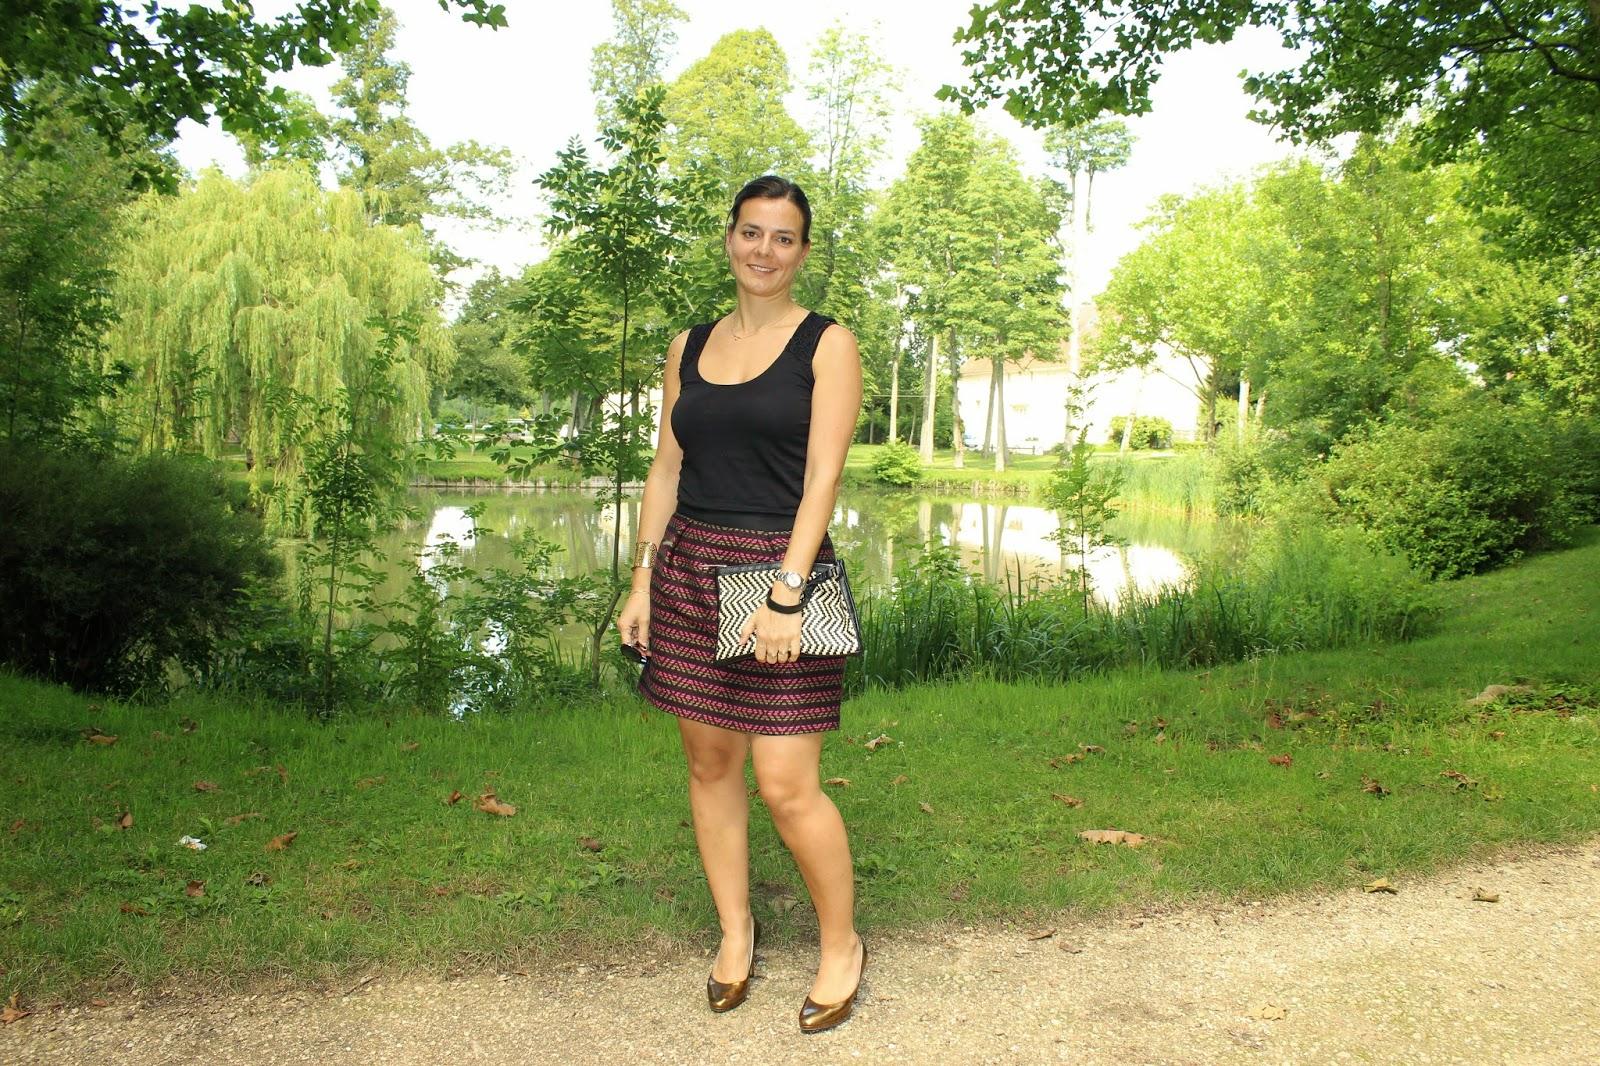 jupe jacquard comptoir des cotonniers, top Naf Naf, pochette Primark